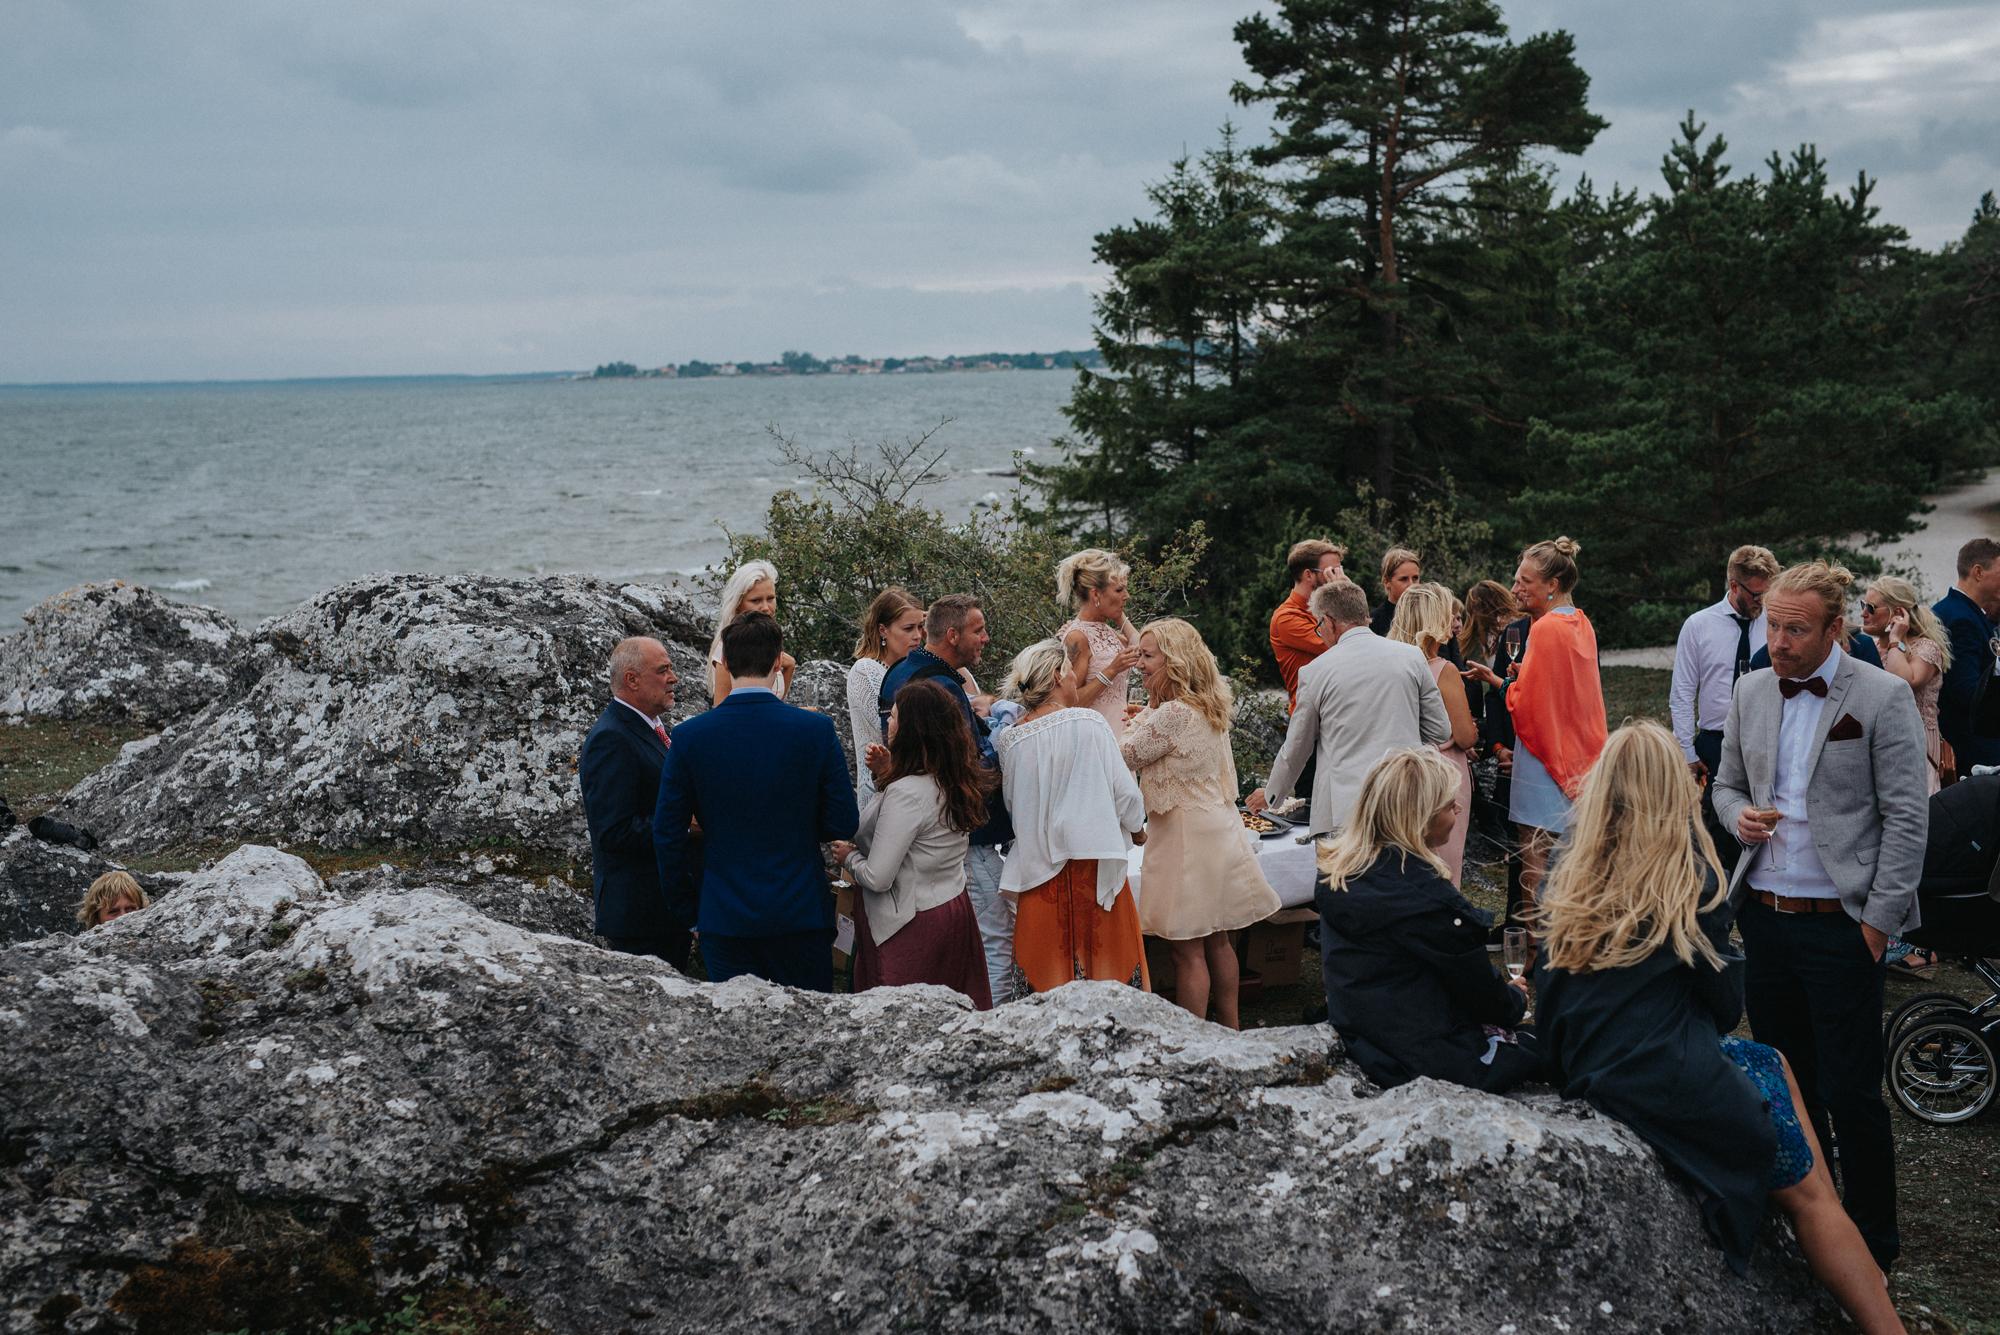 042-bröllopsfotograf-folhammar-gotland-neas-fotografi.jpg